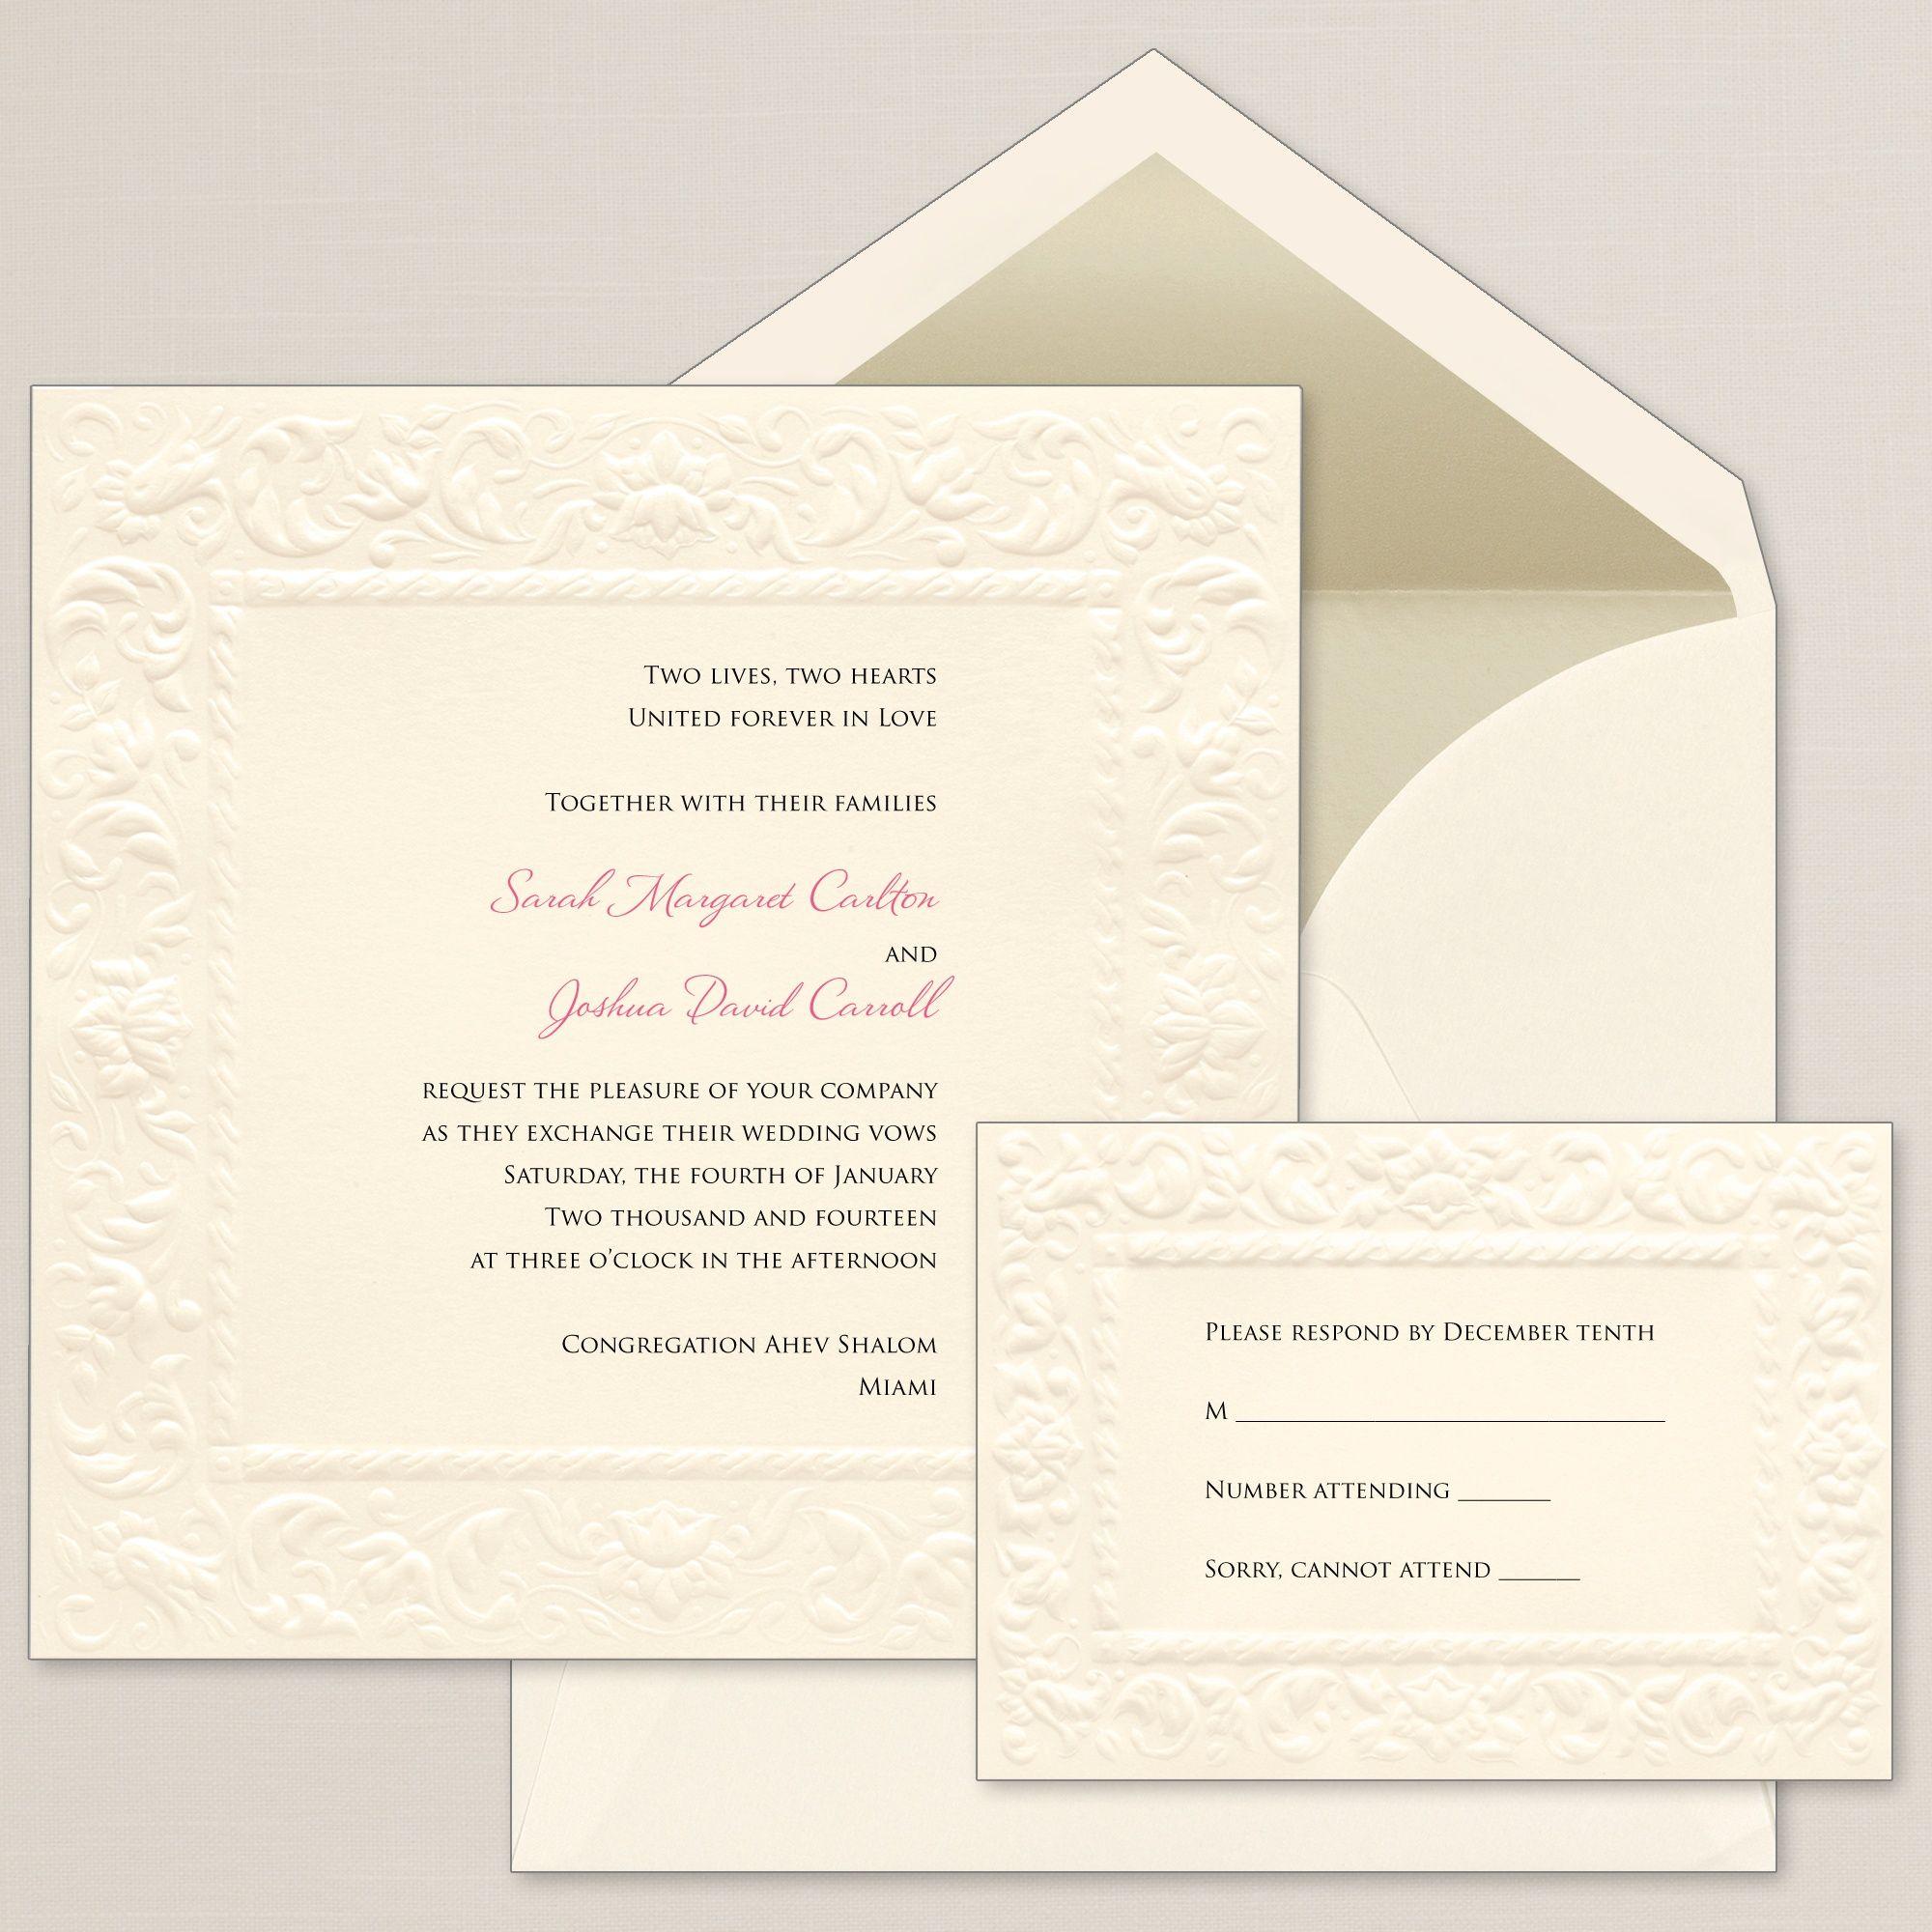 Old World Elegance Wedding Invitation